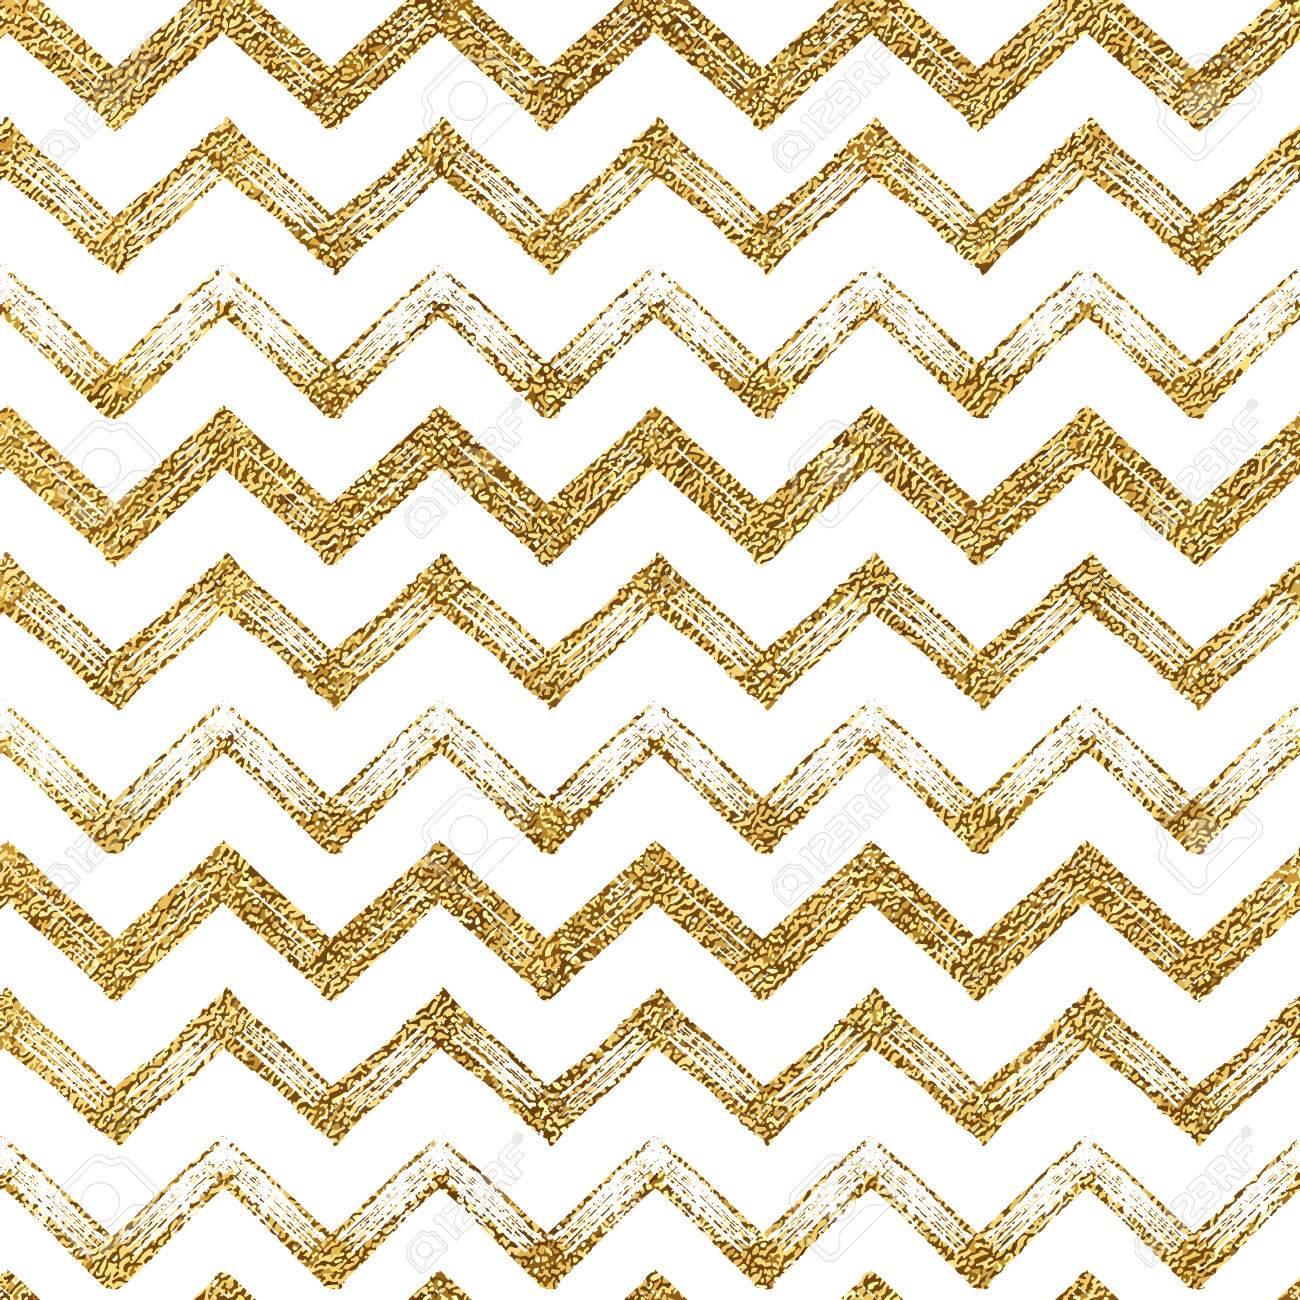 Seamless Pattern Of Gold Glitter Zigzag Chevron Background Golden Zig Zag Stripes